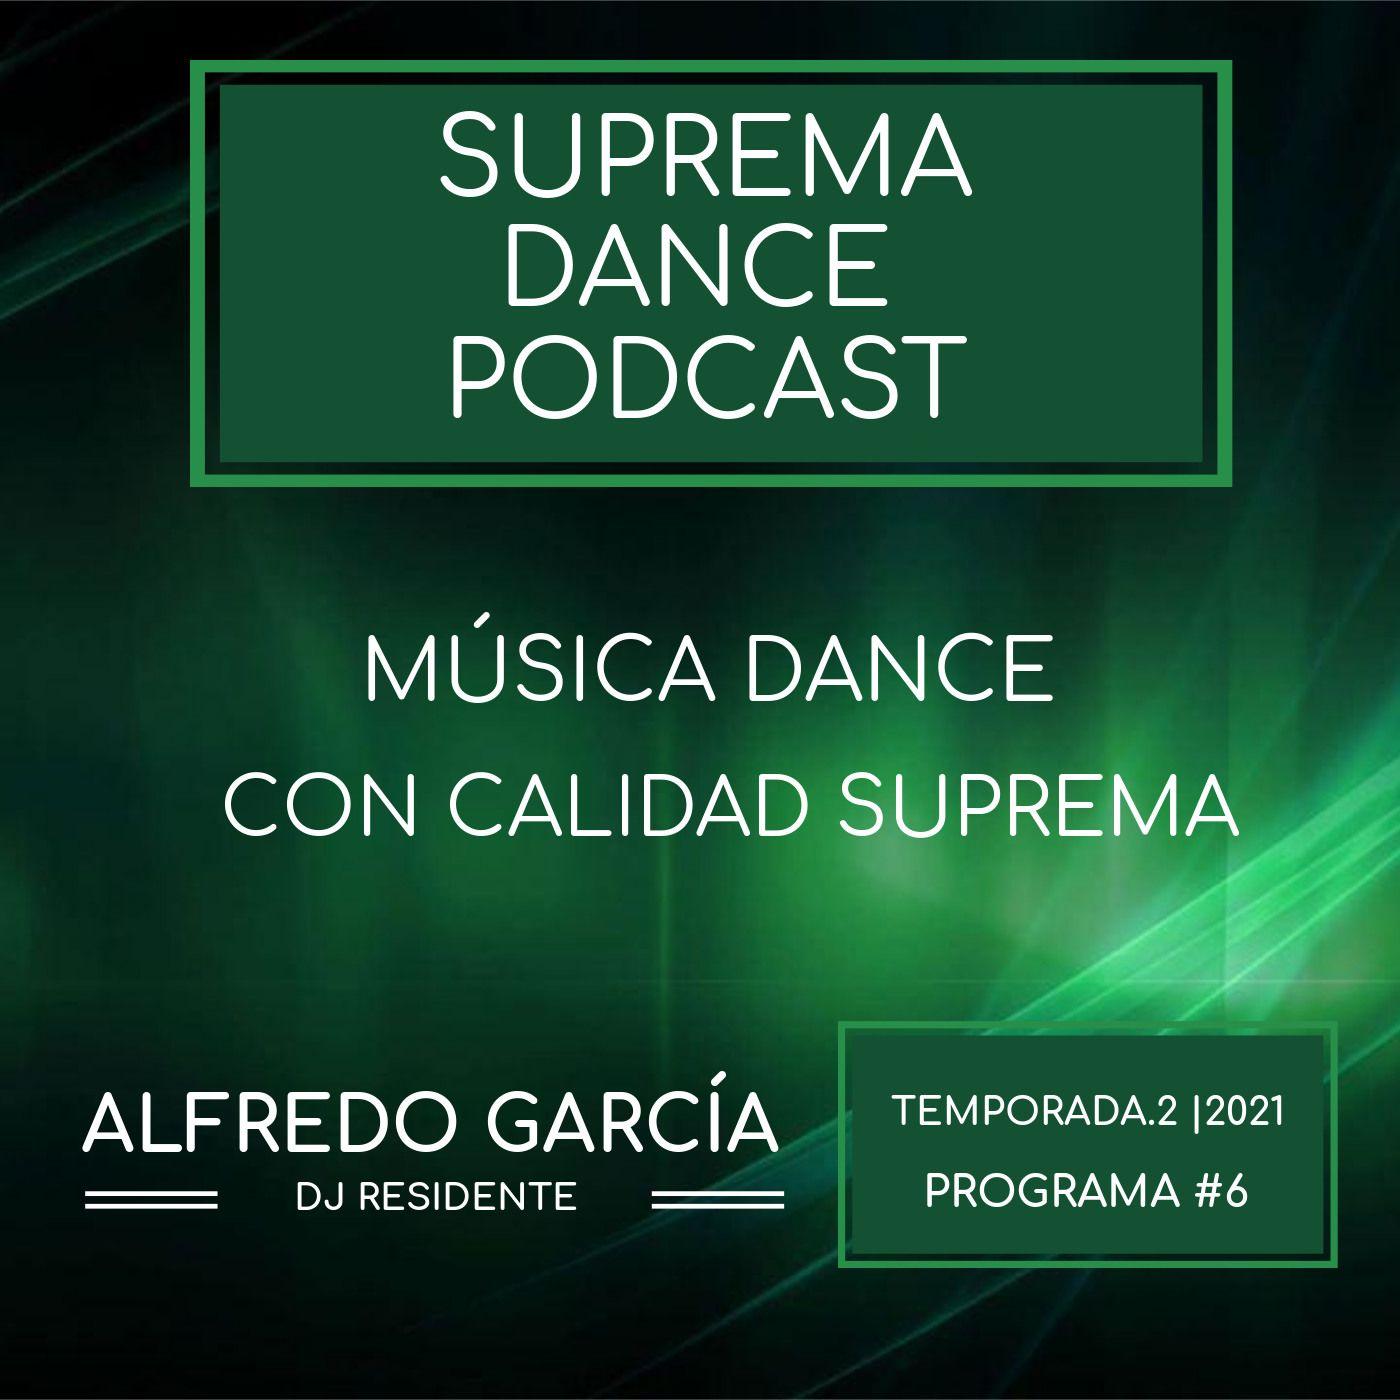 DJ Residente Alfredo García | Programa-6 | T.2 | SDP